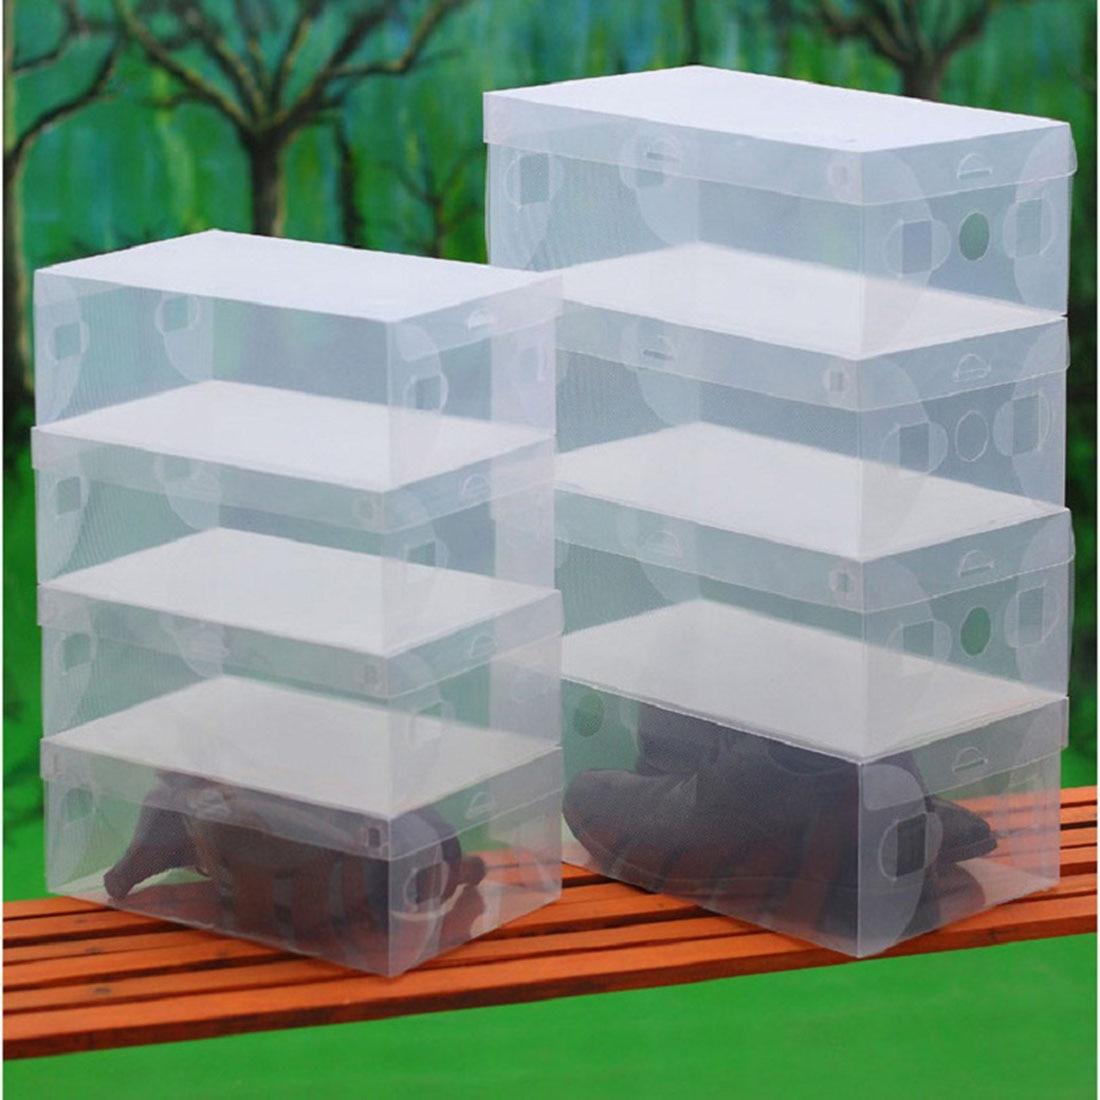 New Style 10Pcs Transparent Clear Plastic Shoes Storage Boxes Foldable Shoes  Case Holder